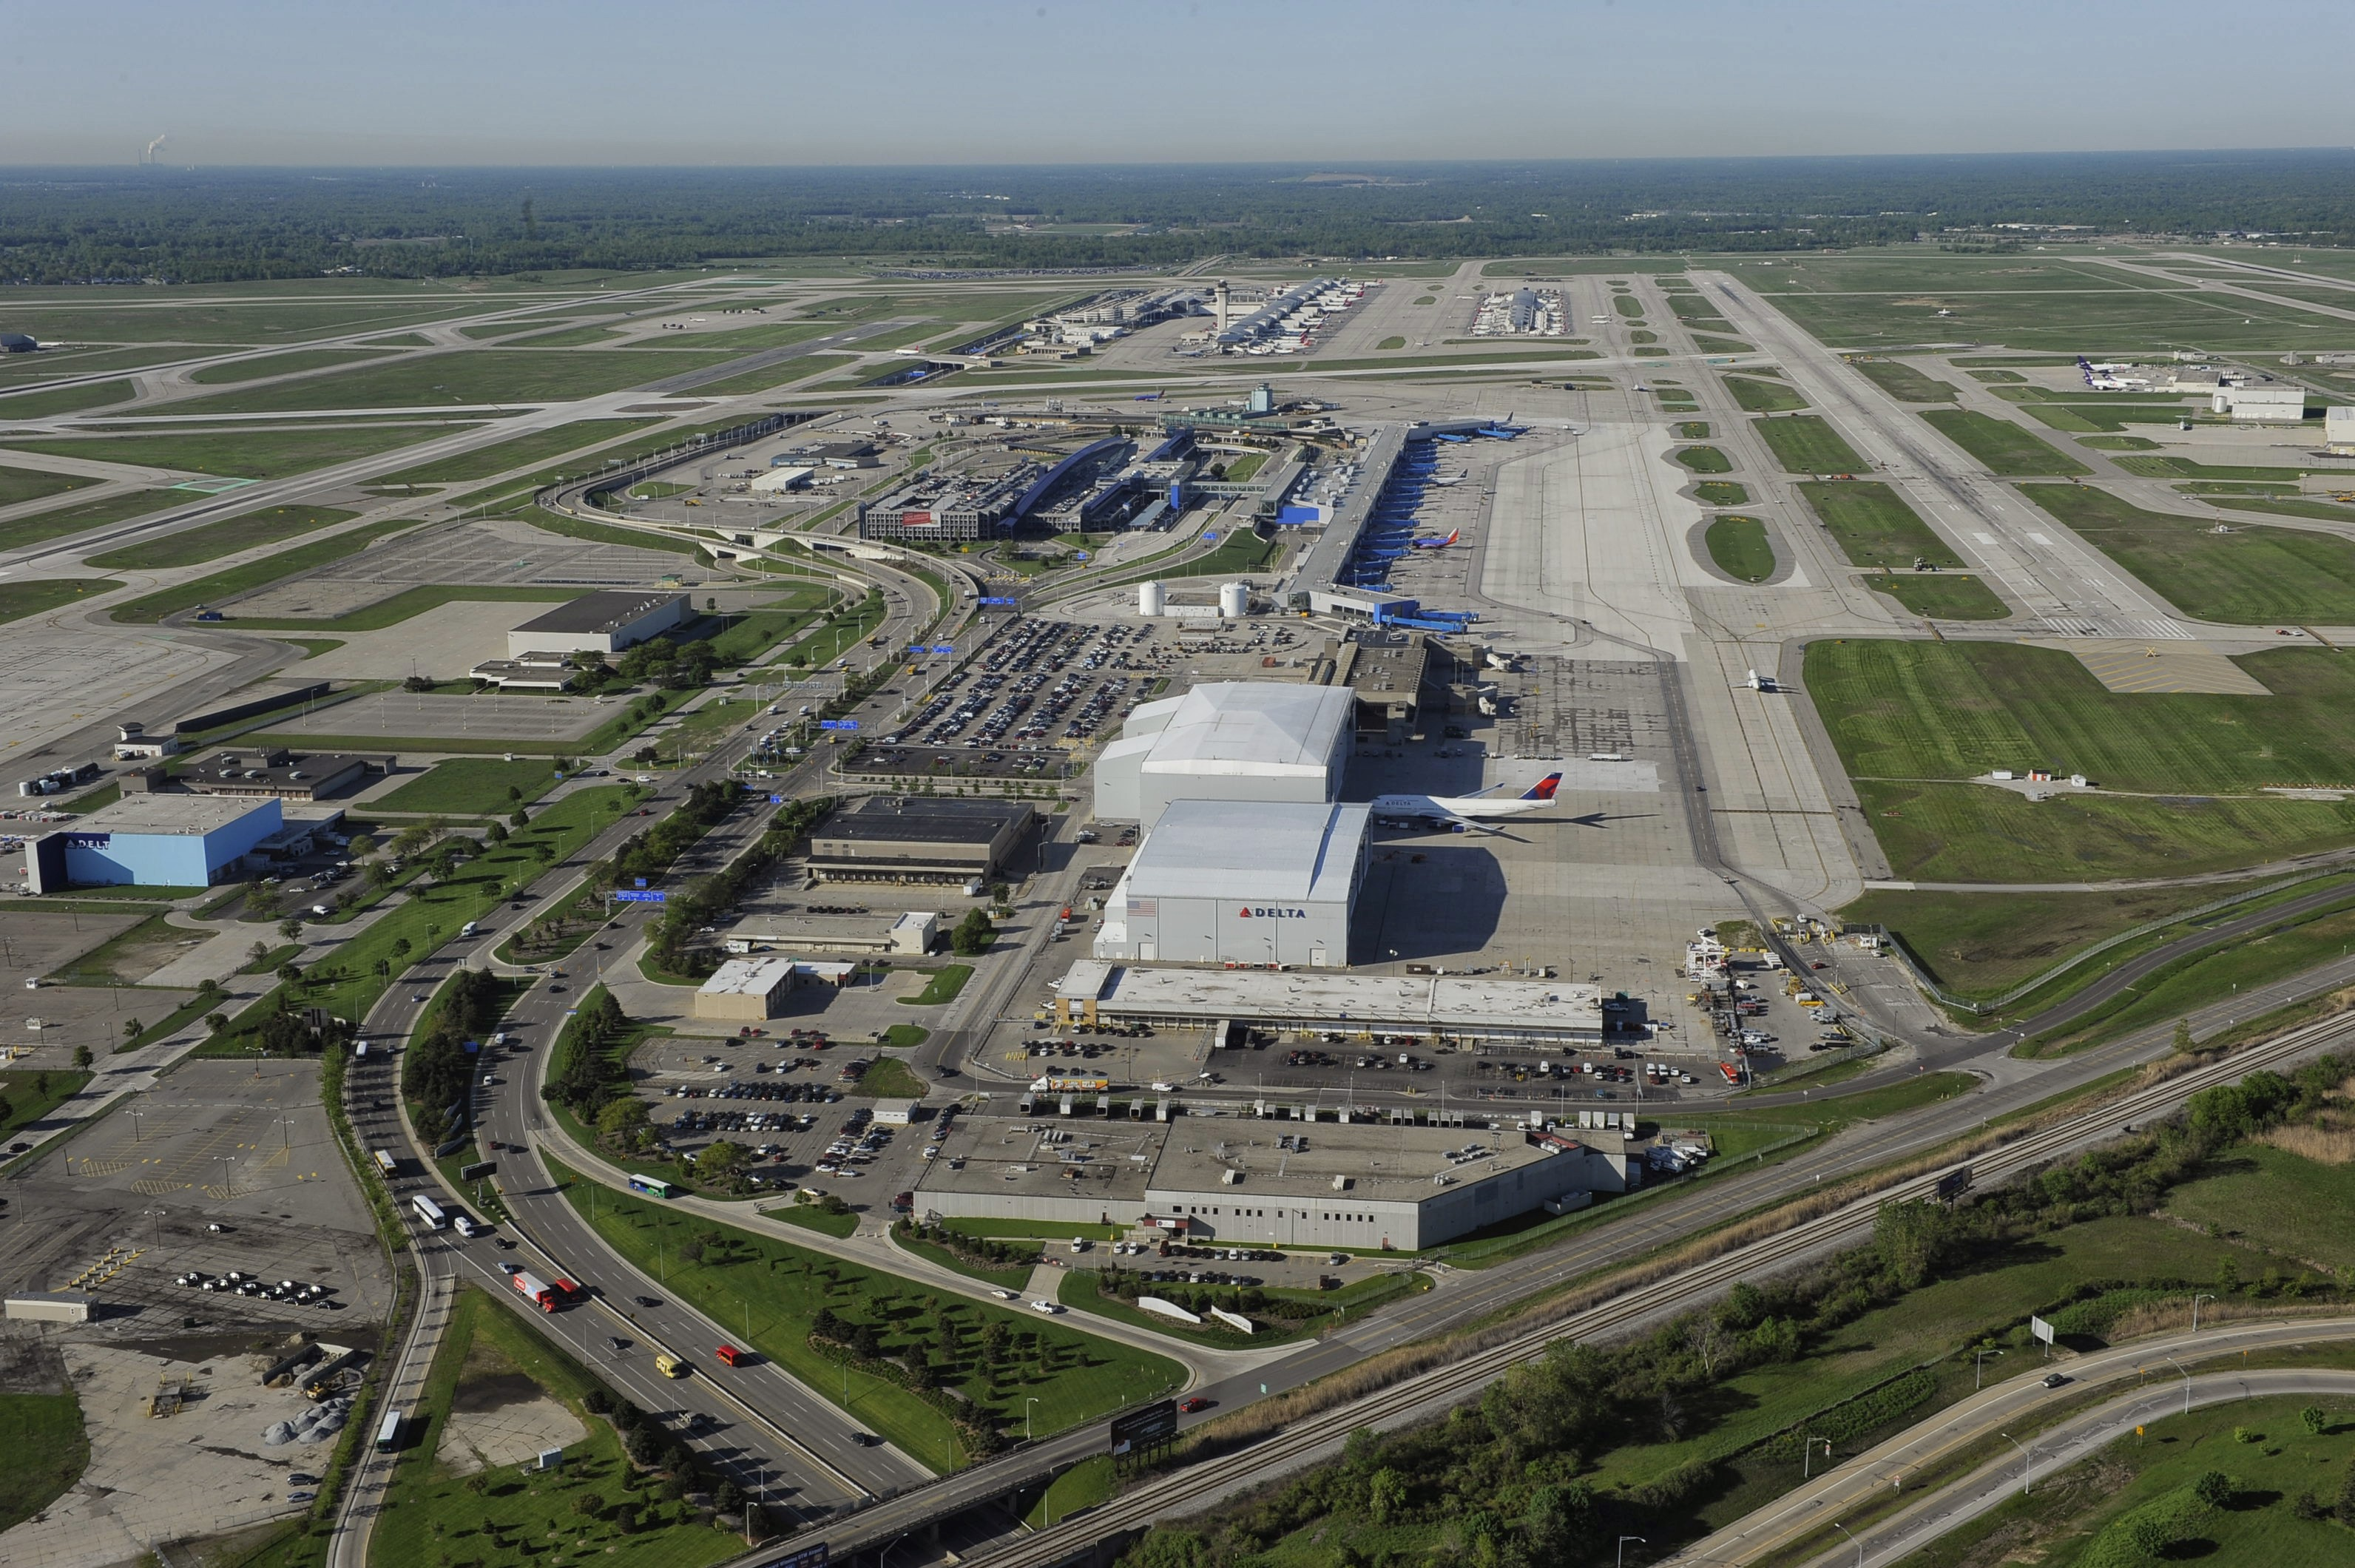 https://assets.sourcemedia.com/5c/76/77fac4df4aa485853506c548770f/detroit-metropolitan-airport.jpg